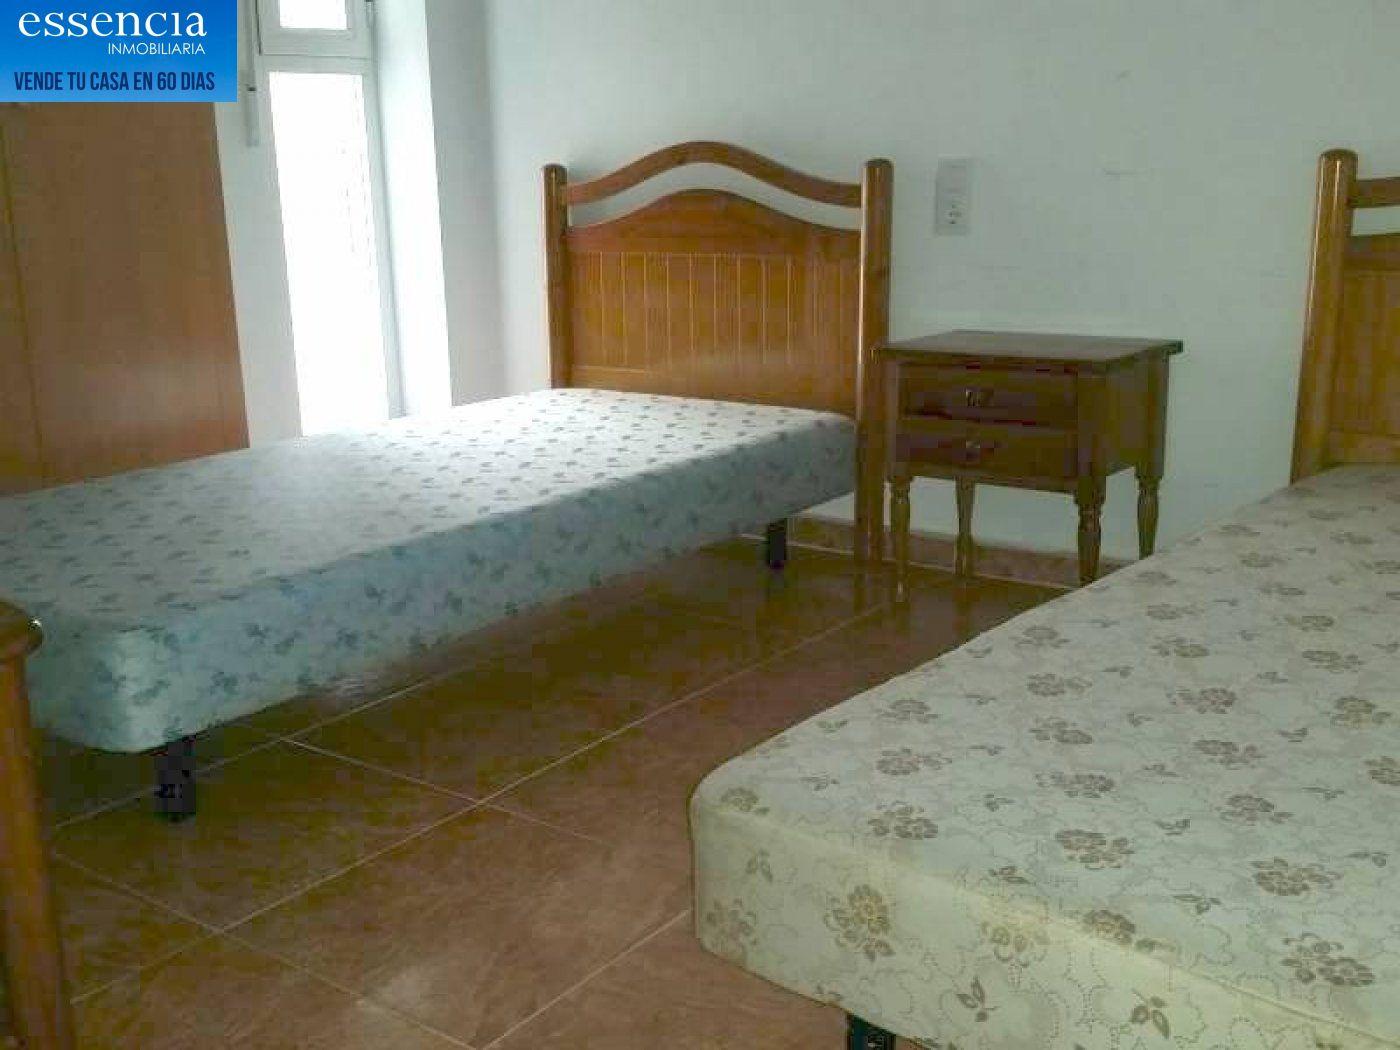 Oferta sin visitar. piso en oliva con ascensor, calle isaac albeniz - imagenInmueble18